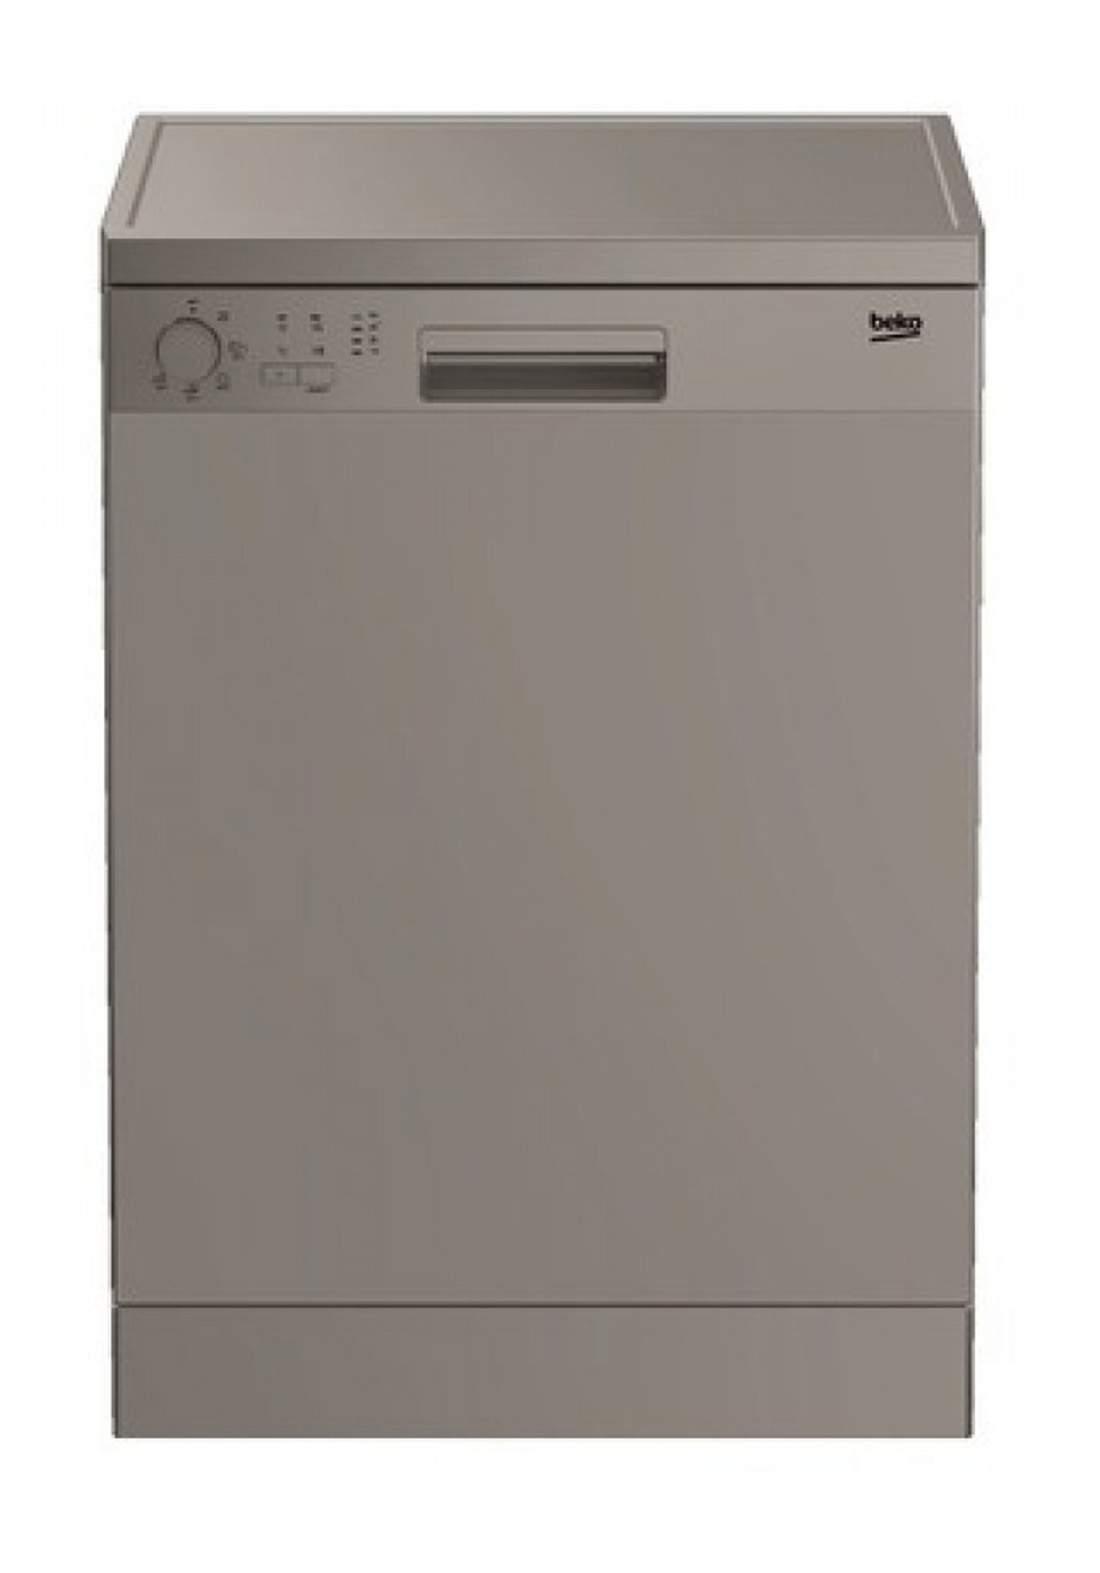 Beko DFN 05320S Dishwasher 5 Programs Capacity Of 13 Sets - Gray  غسالة صحون